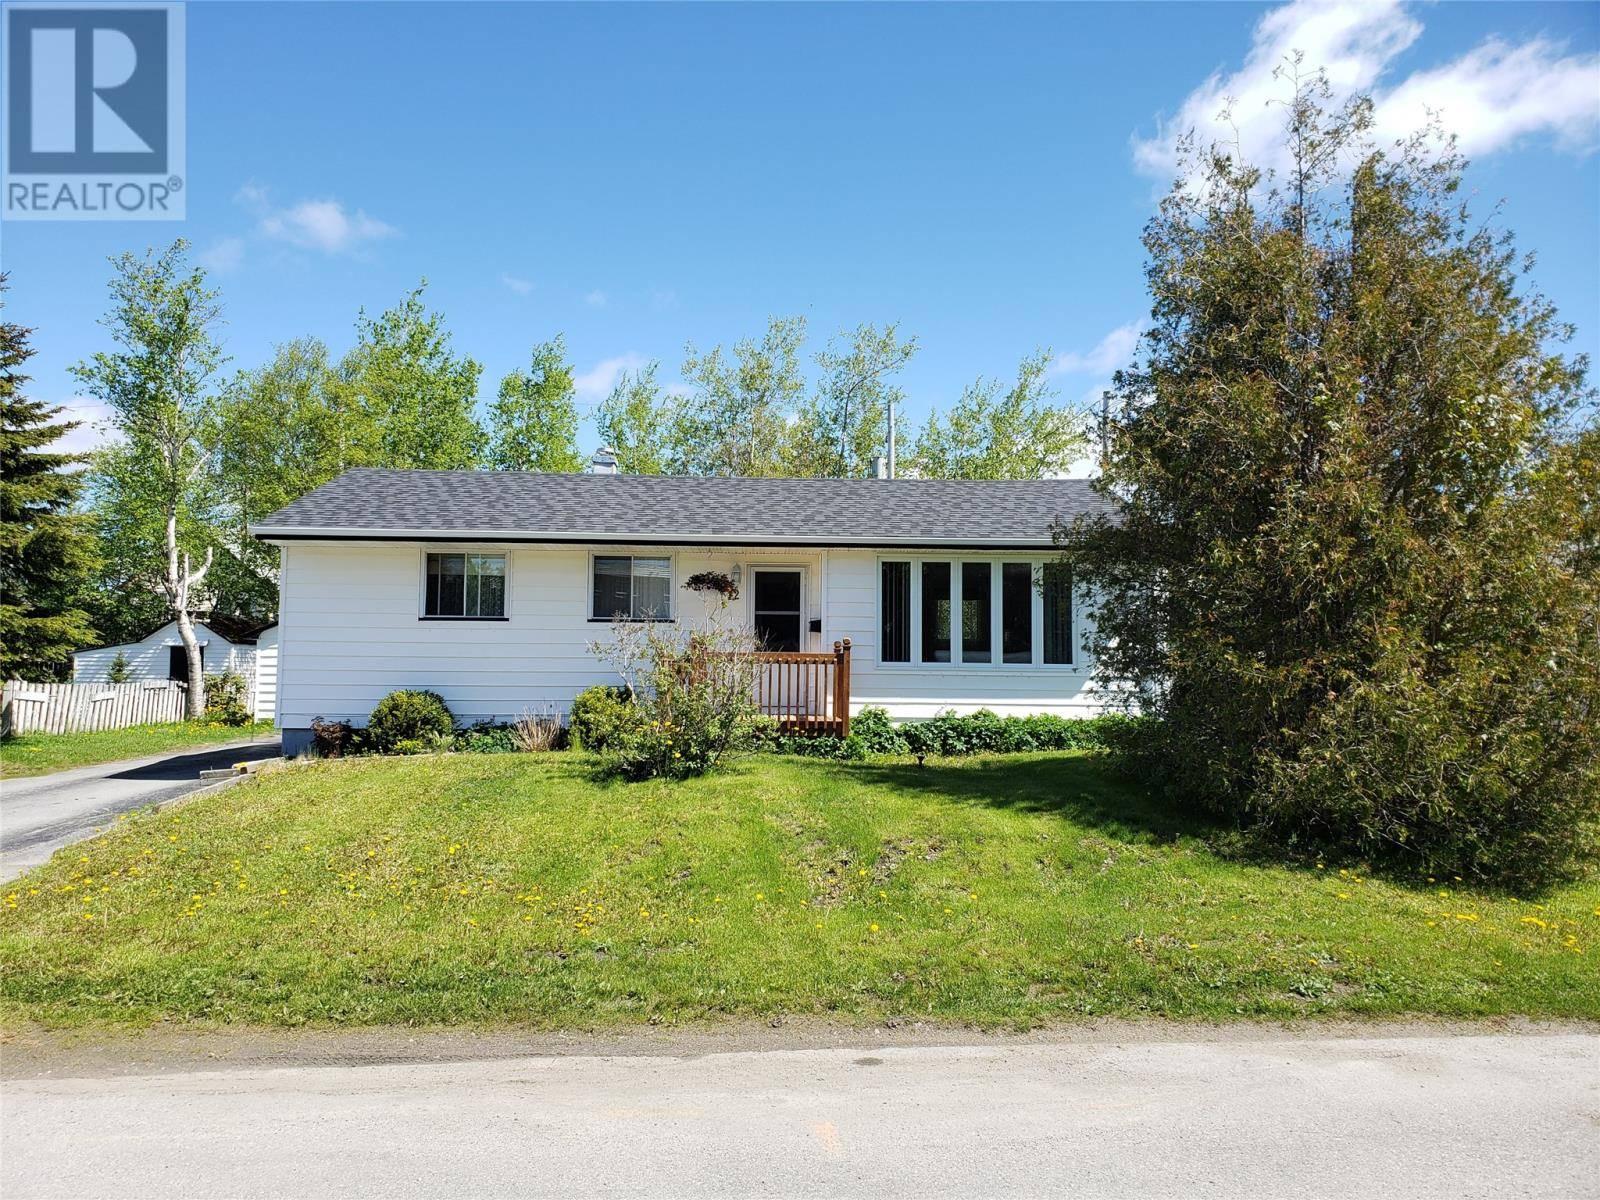 House for sale at 42 Alcock Cres Gander Newfoundland - MLS: 1198146